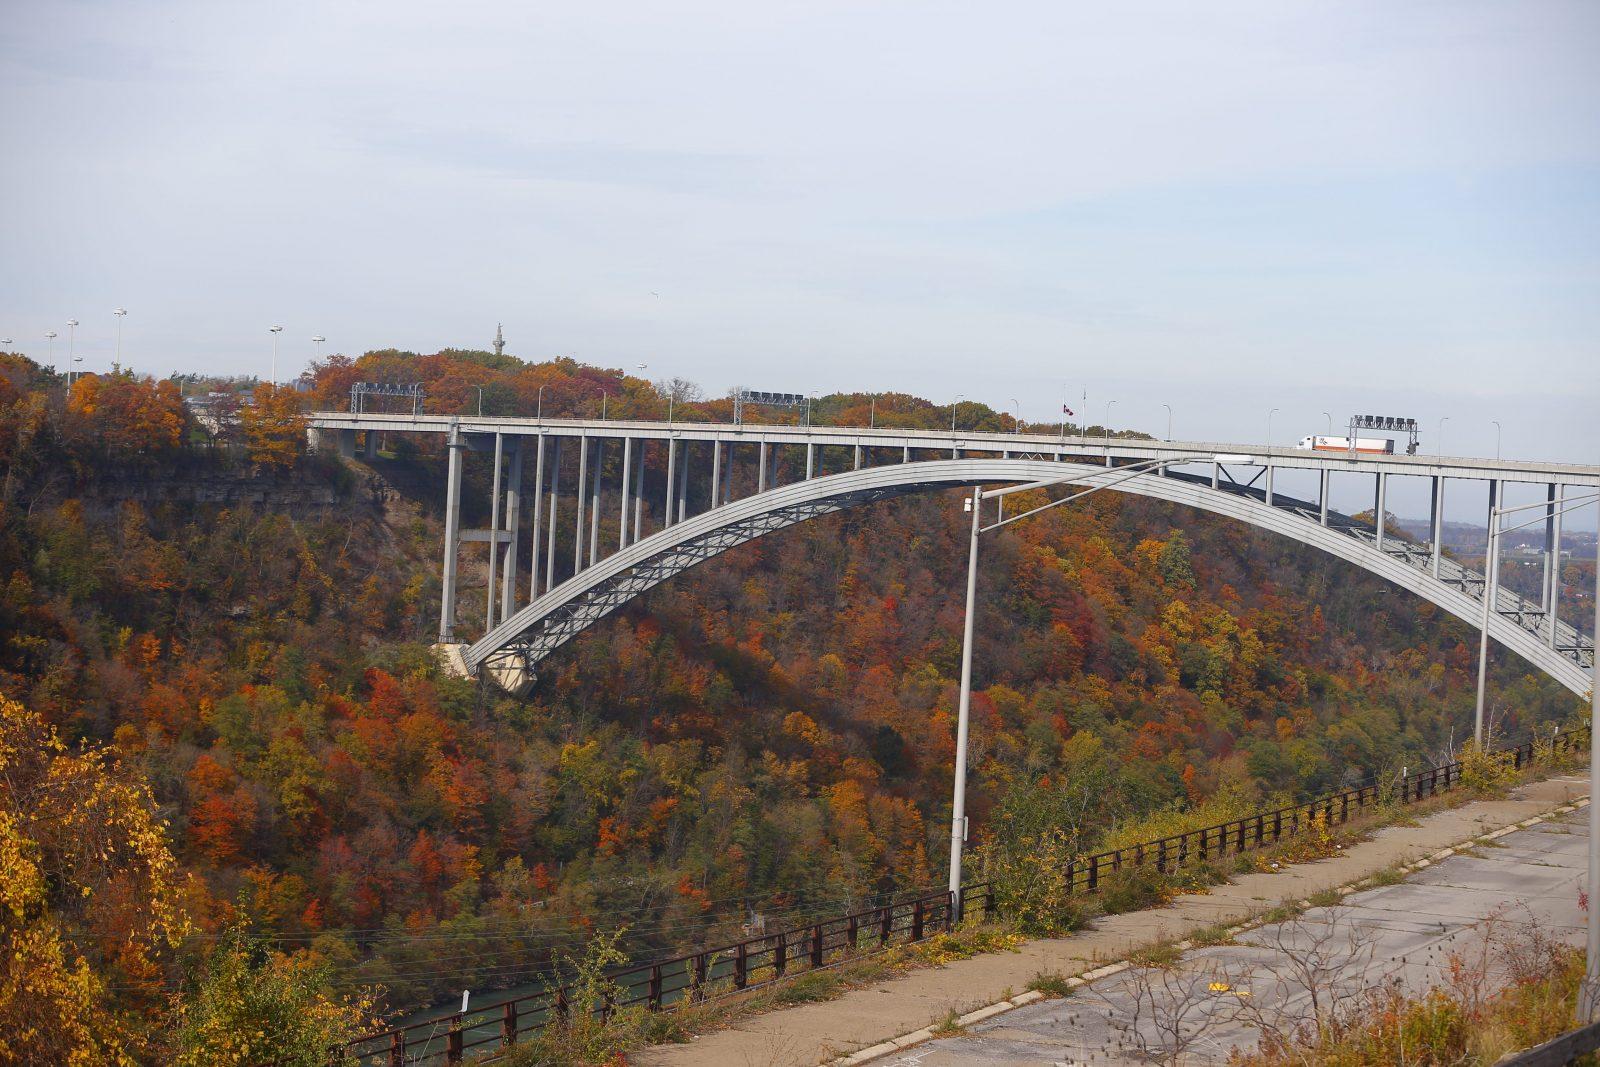 Labor leader Palladino elected chairman of Niagara Falls Bridge Commission